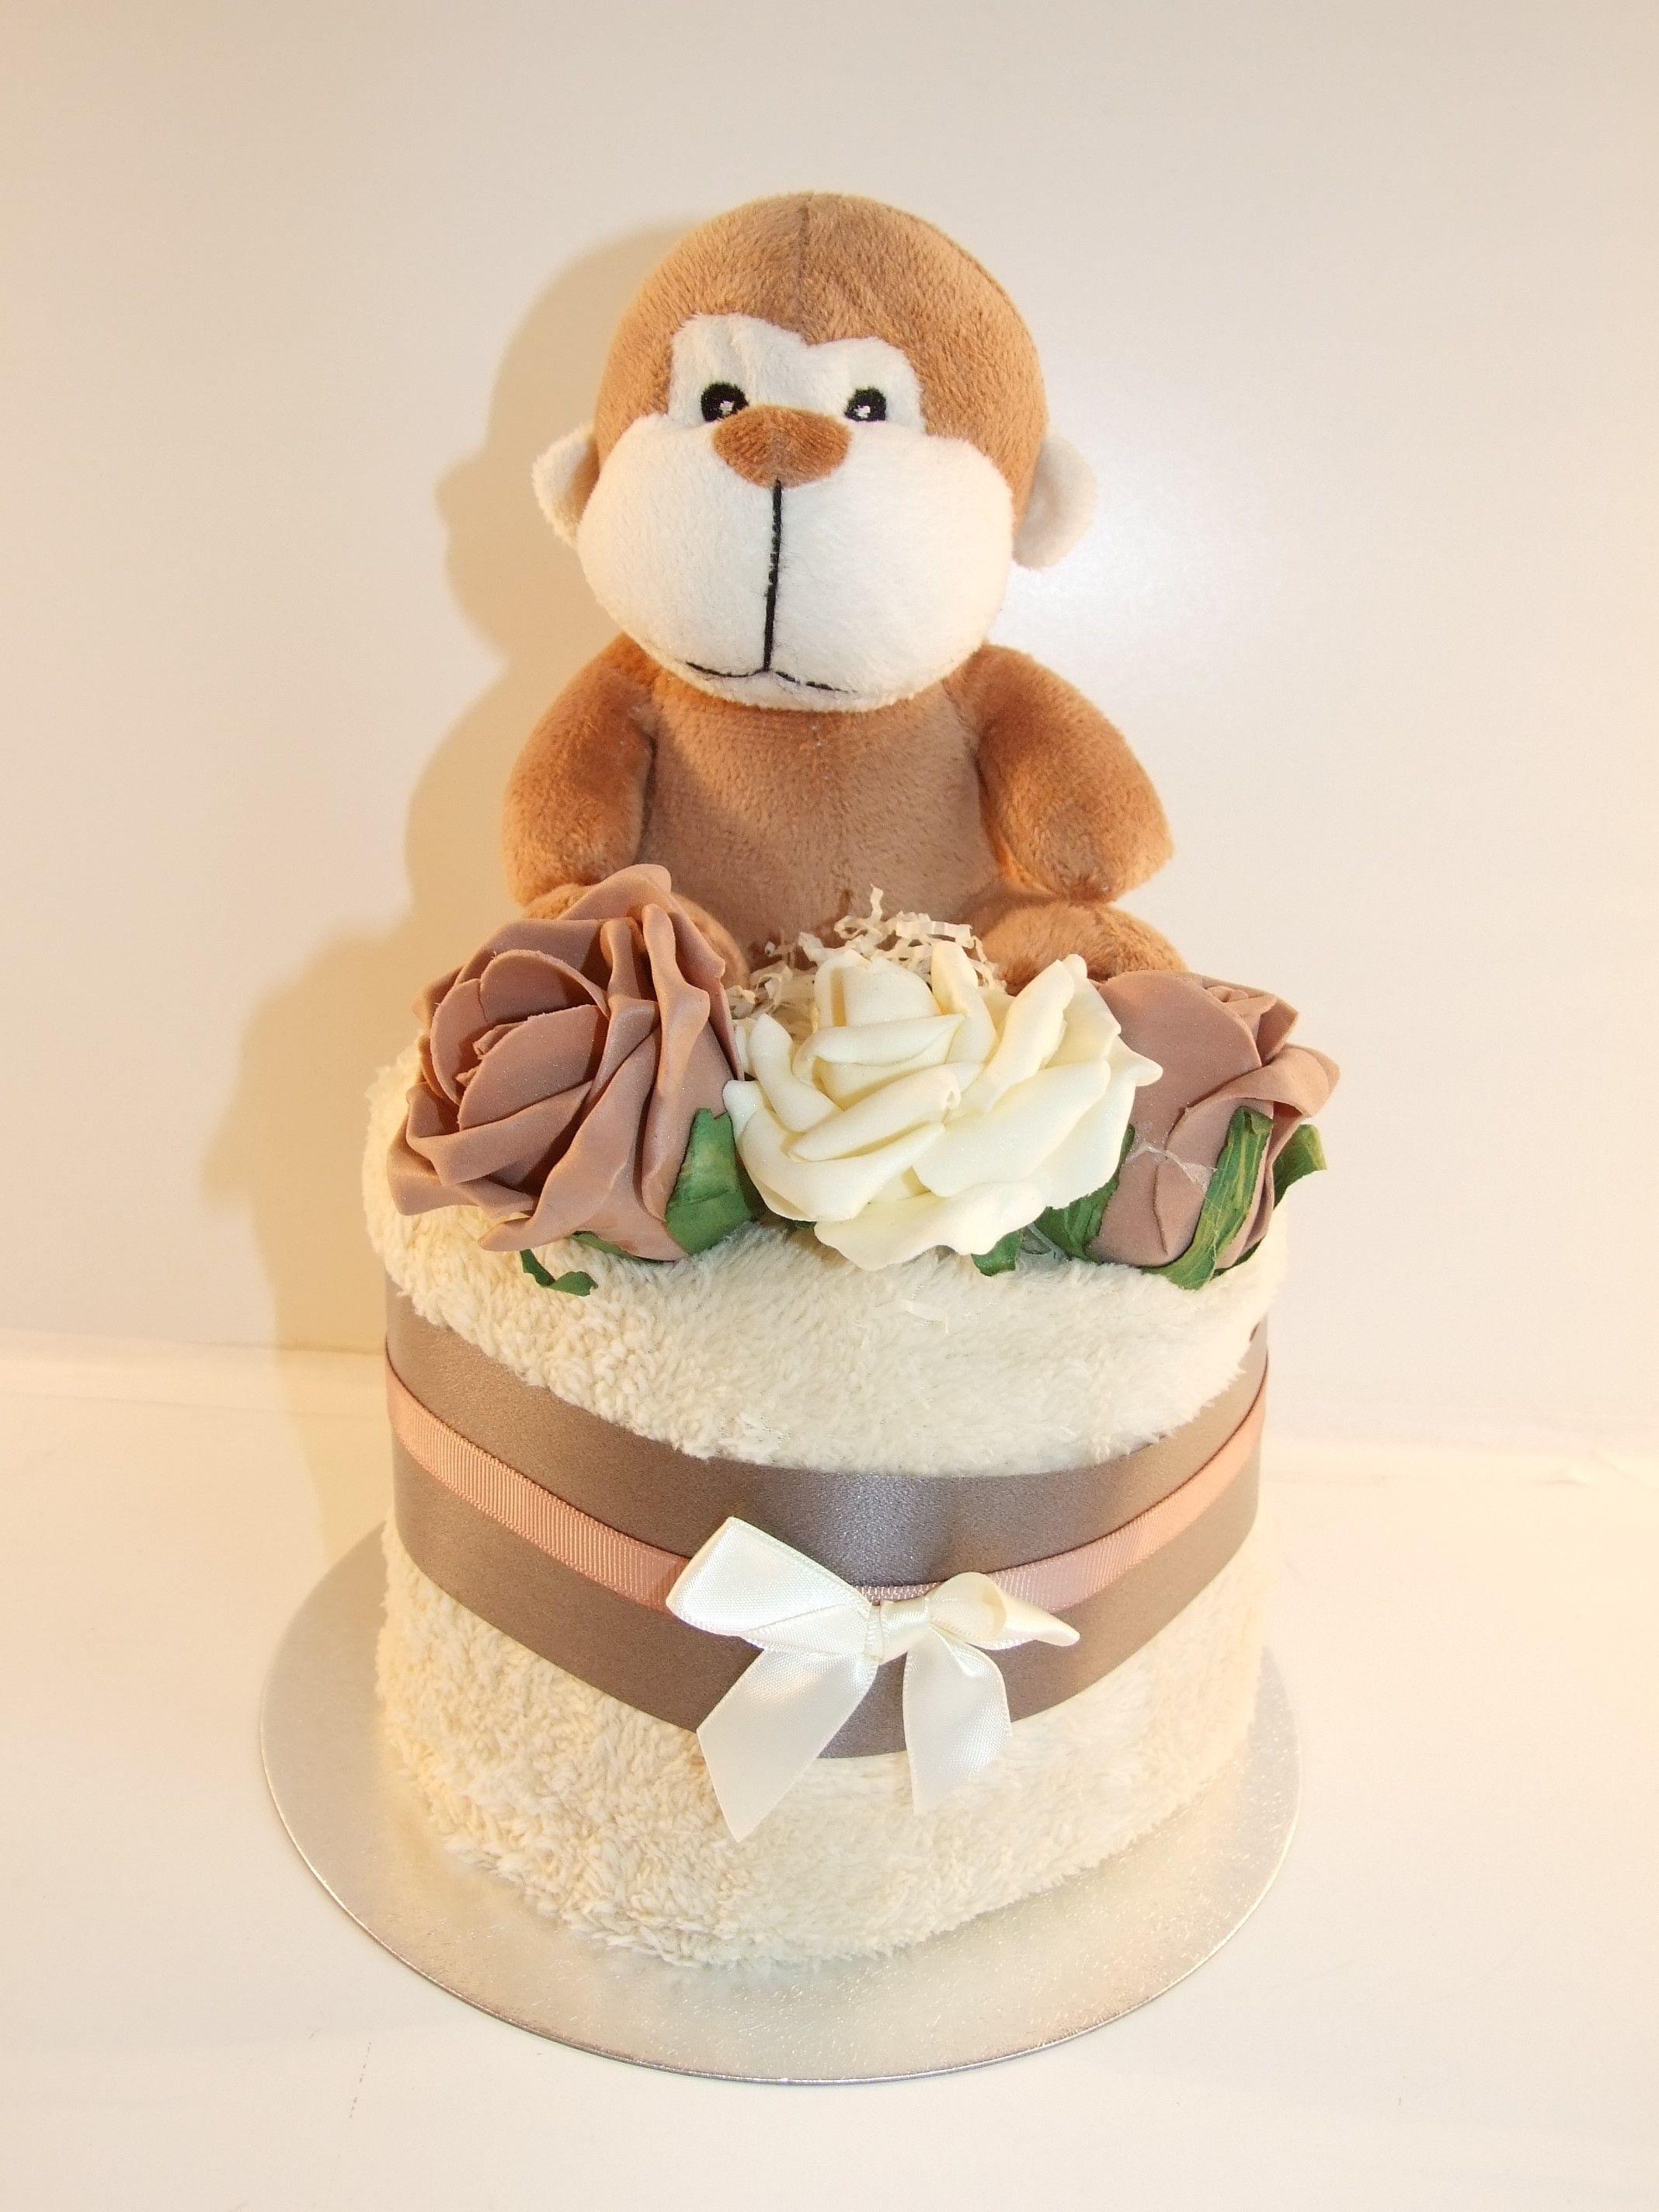 Cute monkey nappy cake - http://www.ebay.co.uk/itm/Nappy-cake-neutral-unisex-boy-or-girl-baby-shower-gift-present-brown-monkey-/191739679487?ssPageName=STRK:MESE:IT